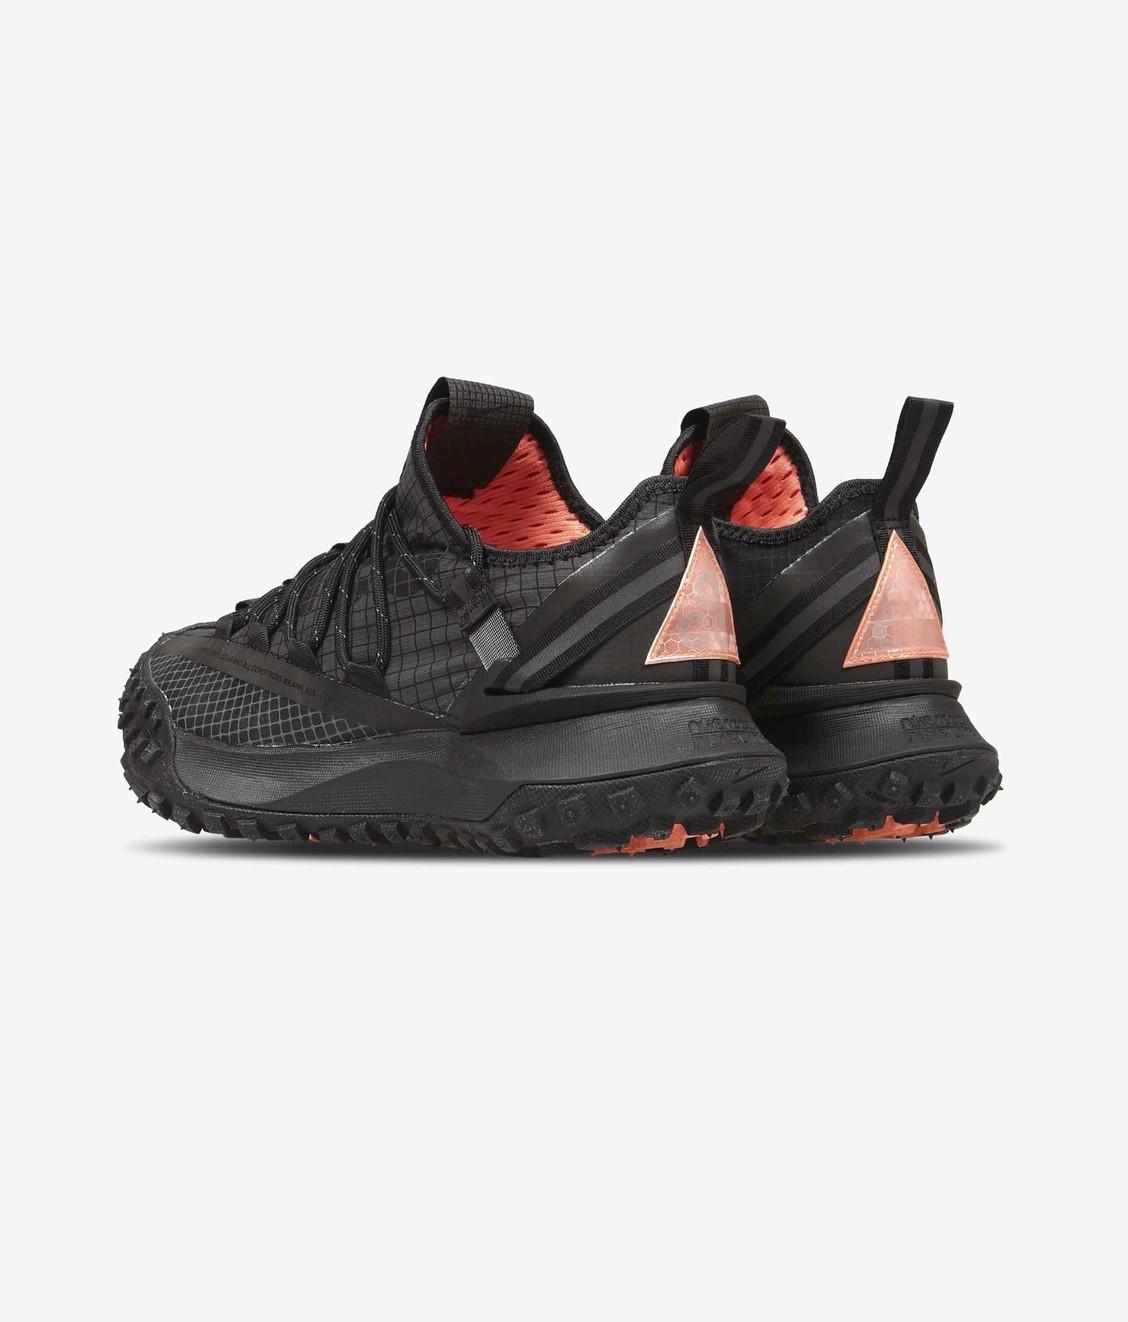 Nike Nike ACG Mountain Fly Low Anthracite/Black